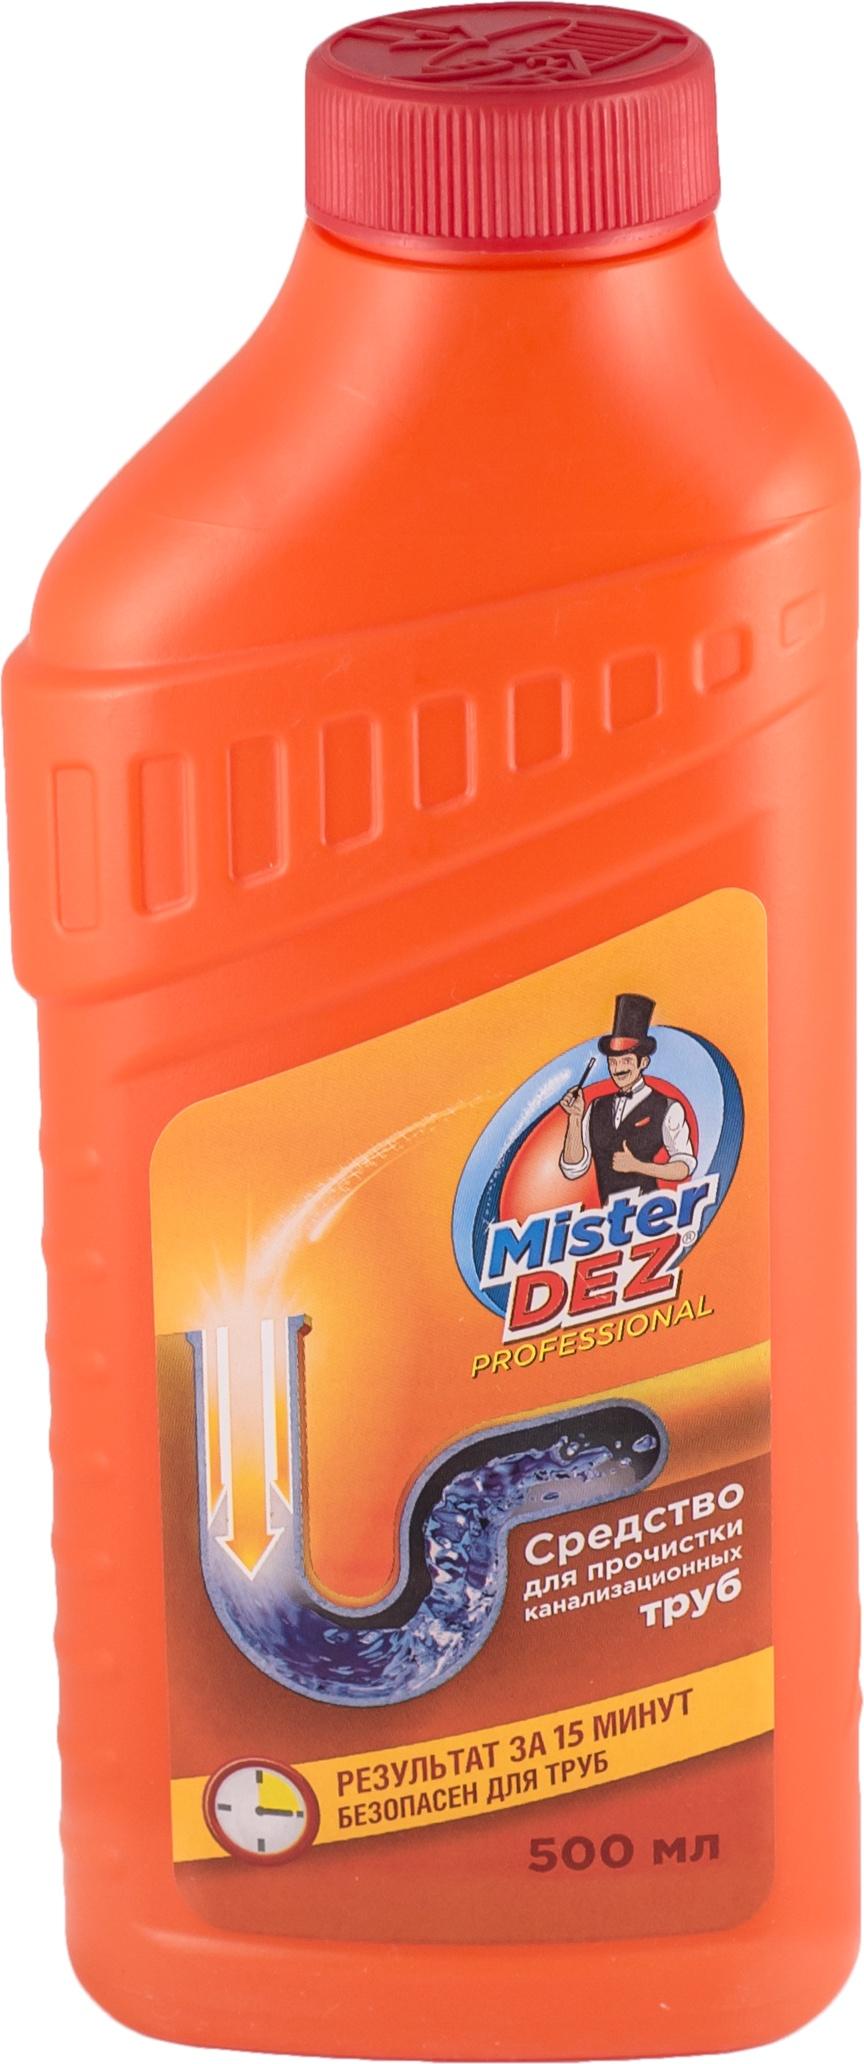 Средство для прочистки канализационных труб Mister Dez PROFESSIONAL 500 мл трос для прочистки канализационных труб 5 5 мм х 3 м